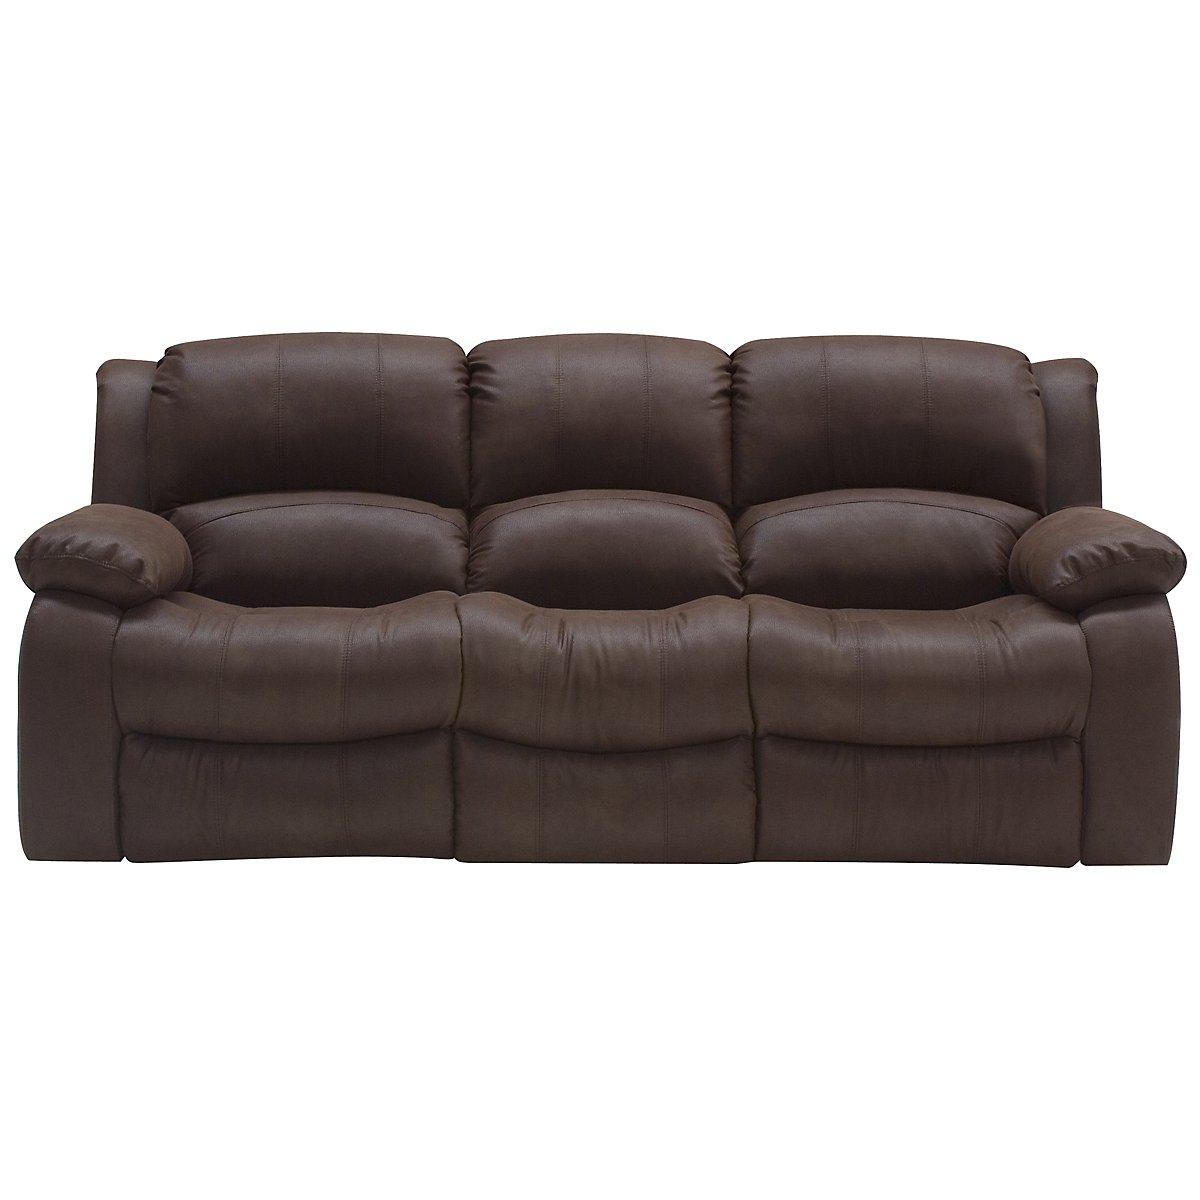 Tyler2 Dark Brown Microfiber Power Reclining Sofa